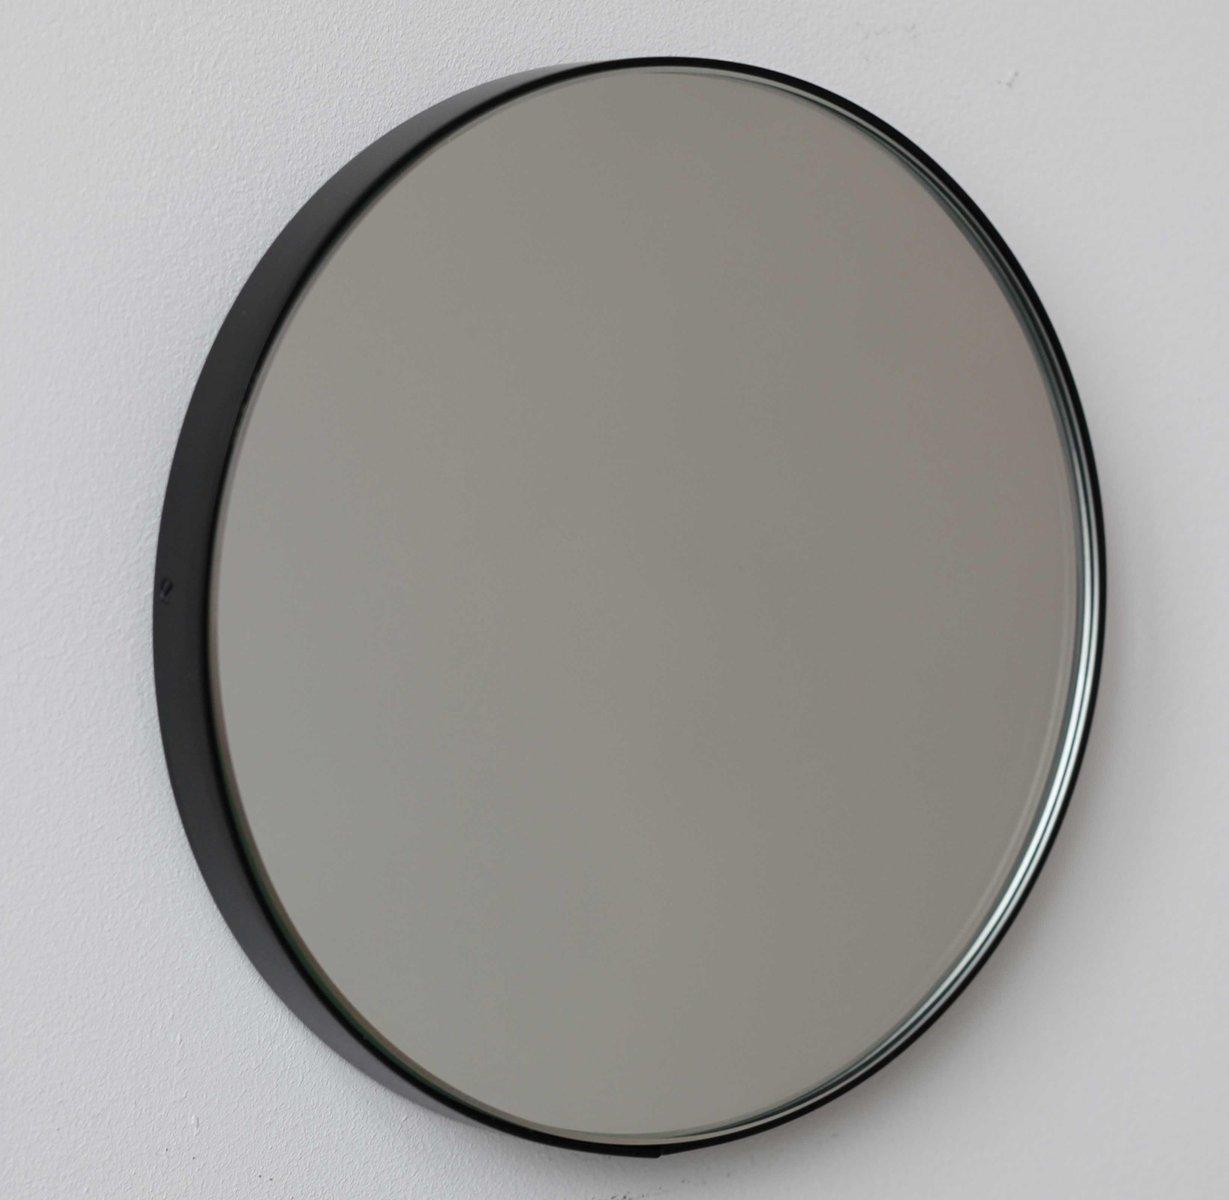 besonders gro er runder silver orbis spiegel mit schwarzem. Black Bedroom Furniture Sets. Home Design Ideas